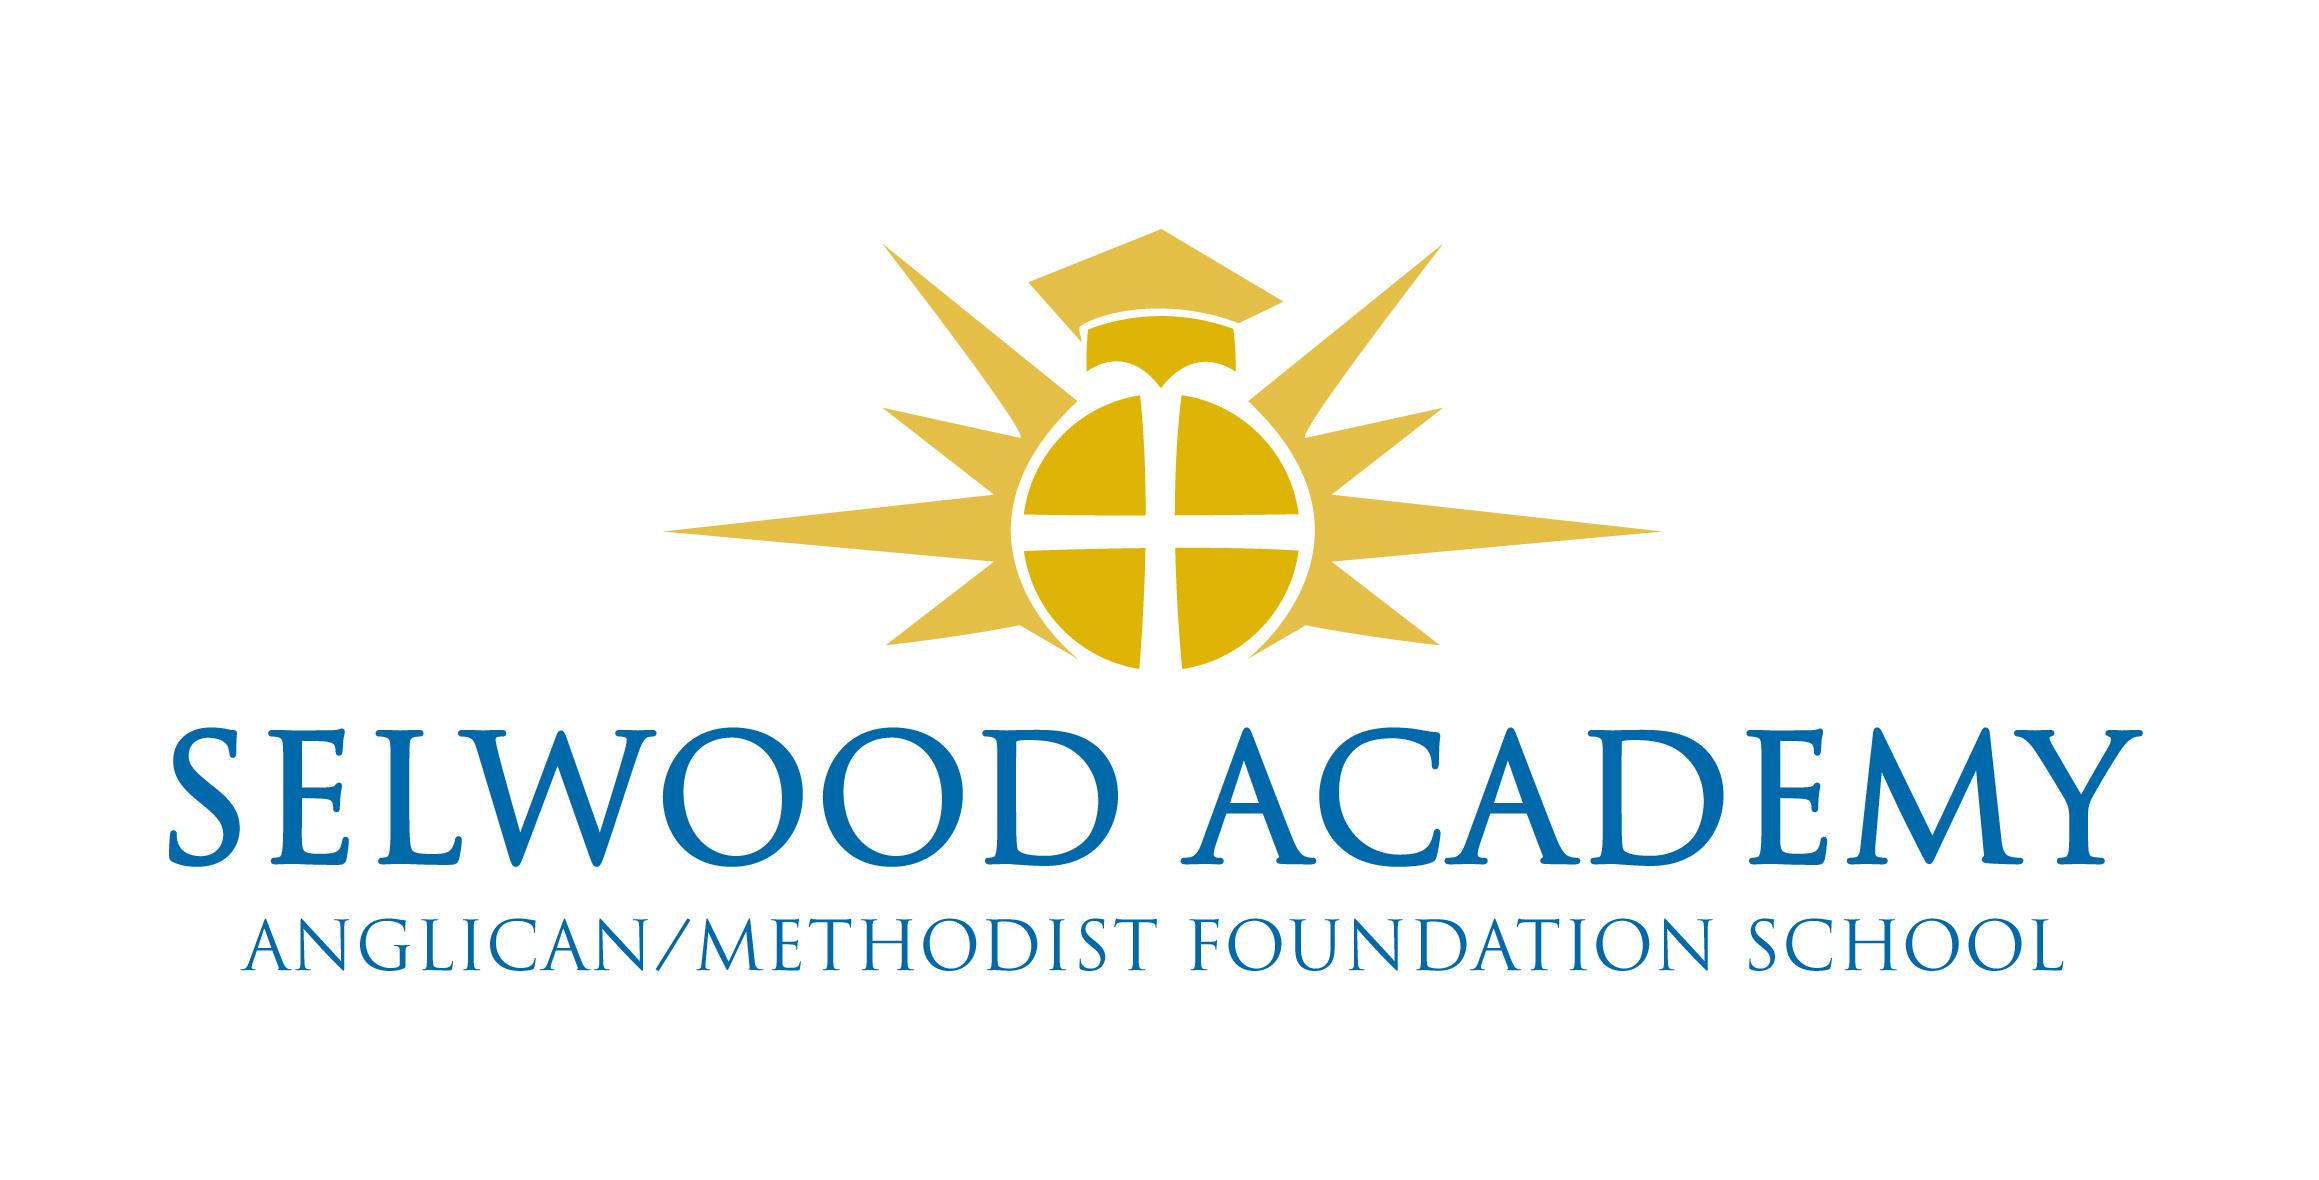 Selwood Academy